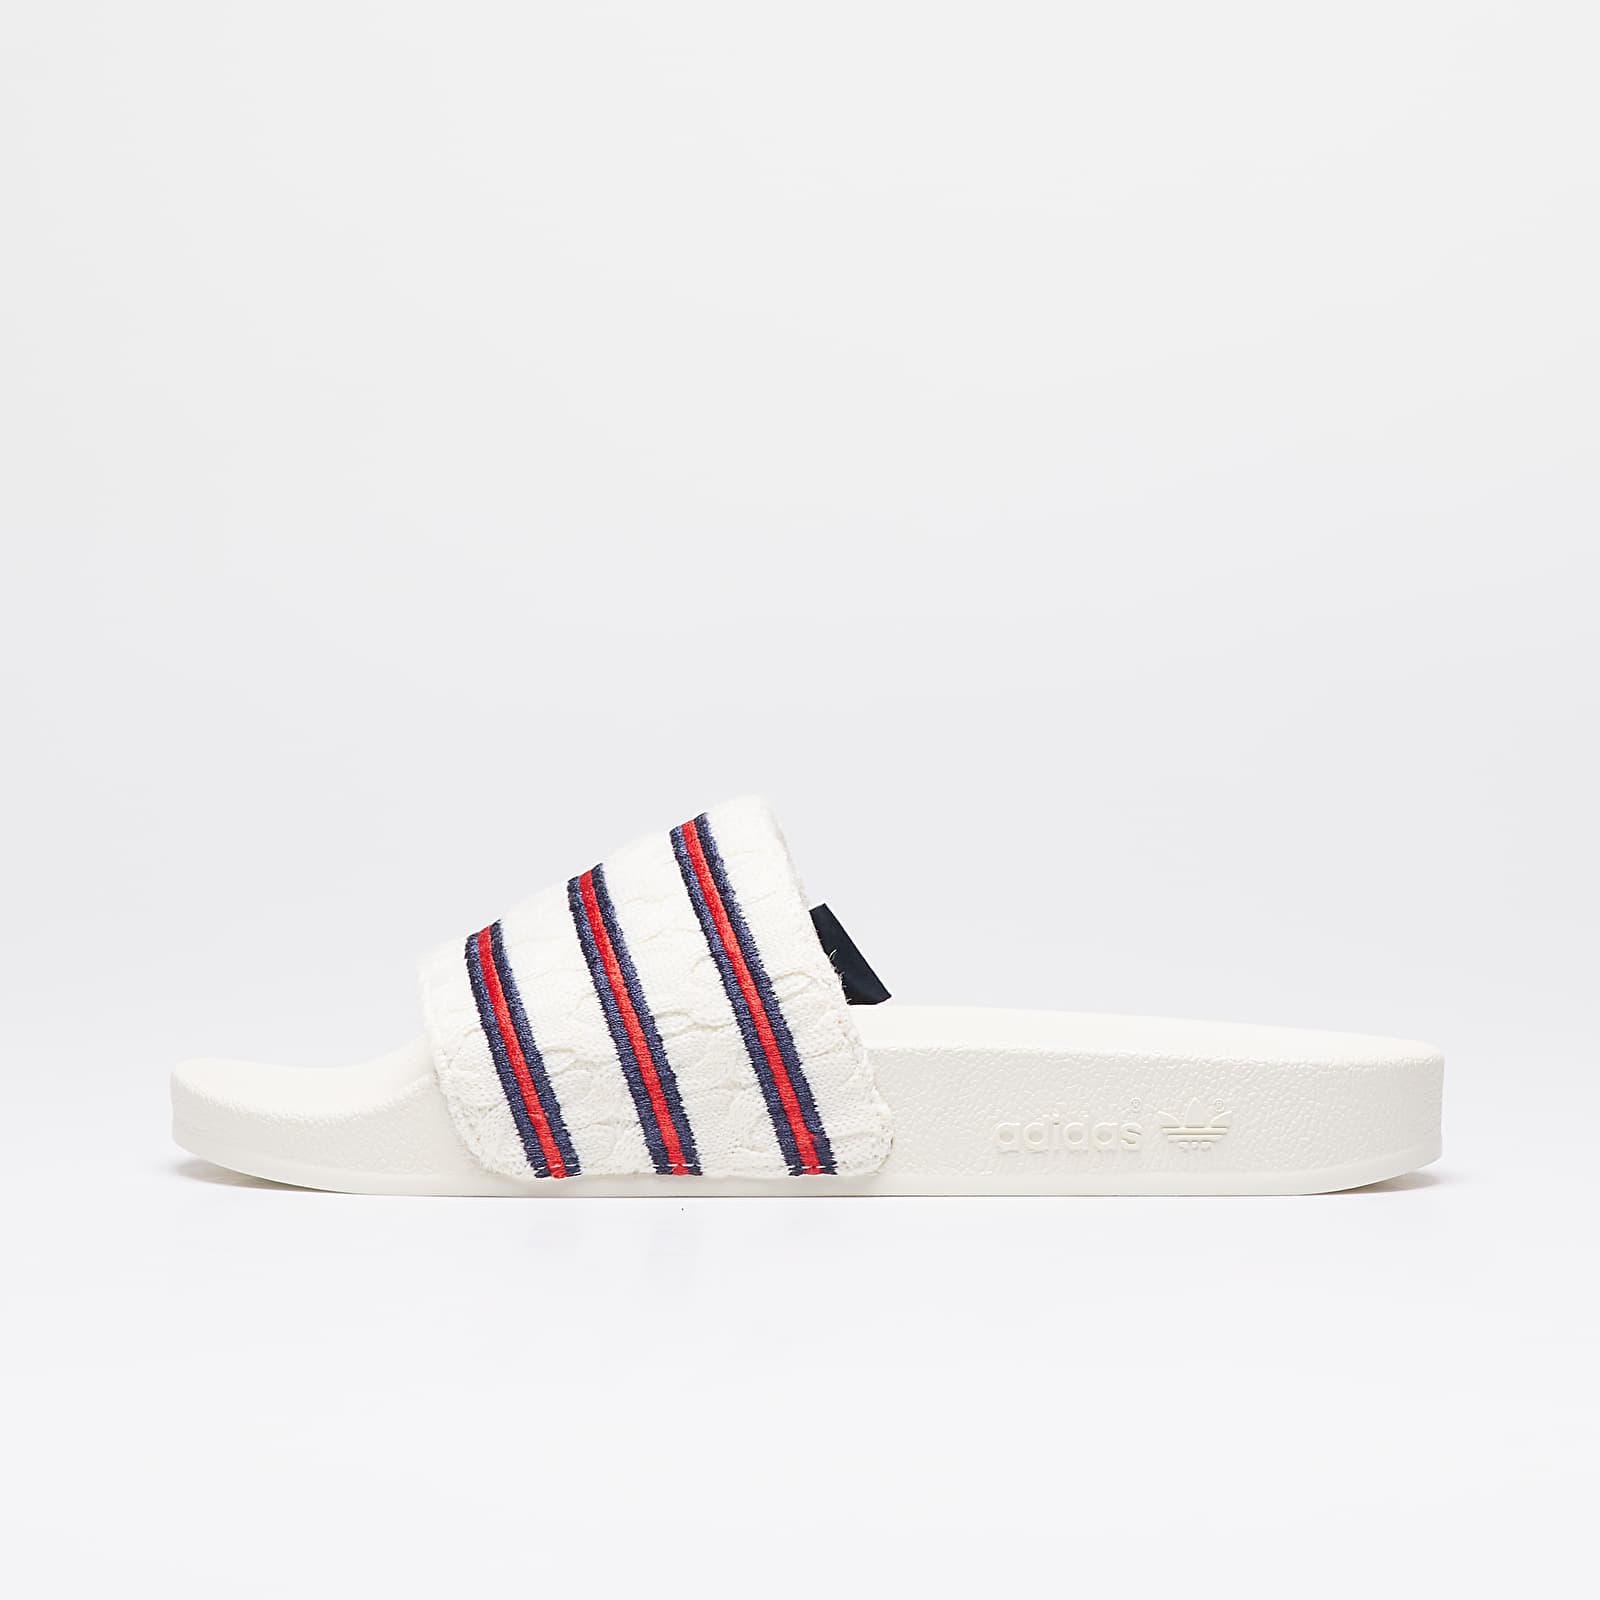 Pánské tenisky a boty adidas Consortium x Extra Butter Adilette Off White/ Collegiate Royal/ Off White